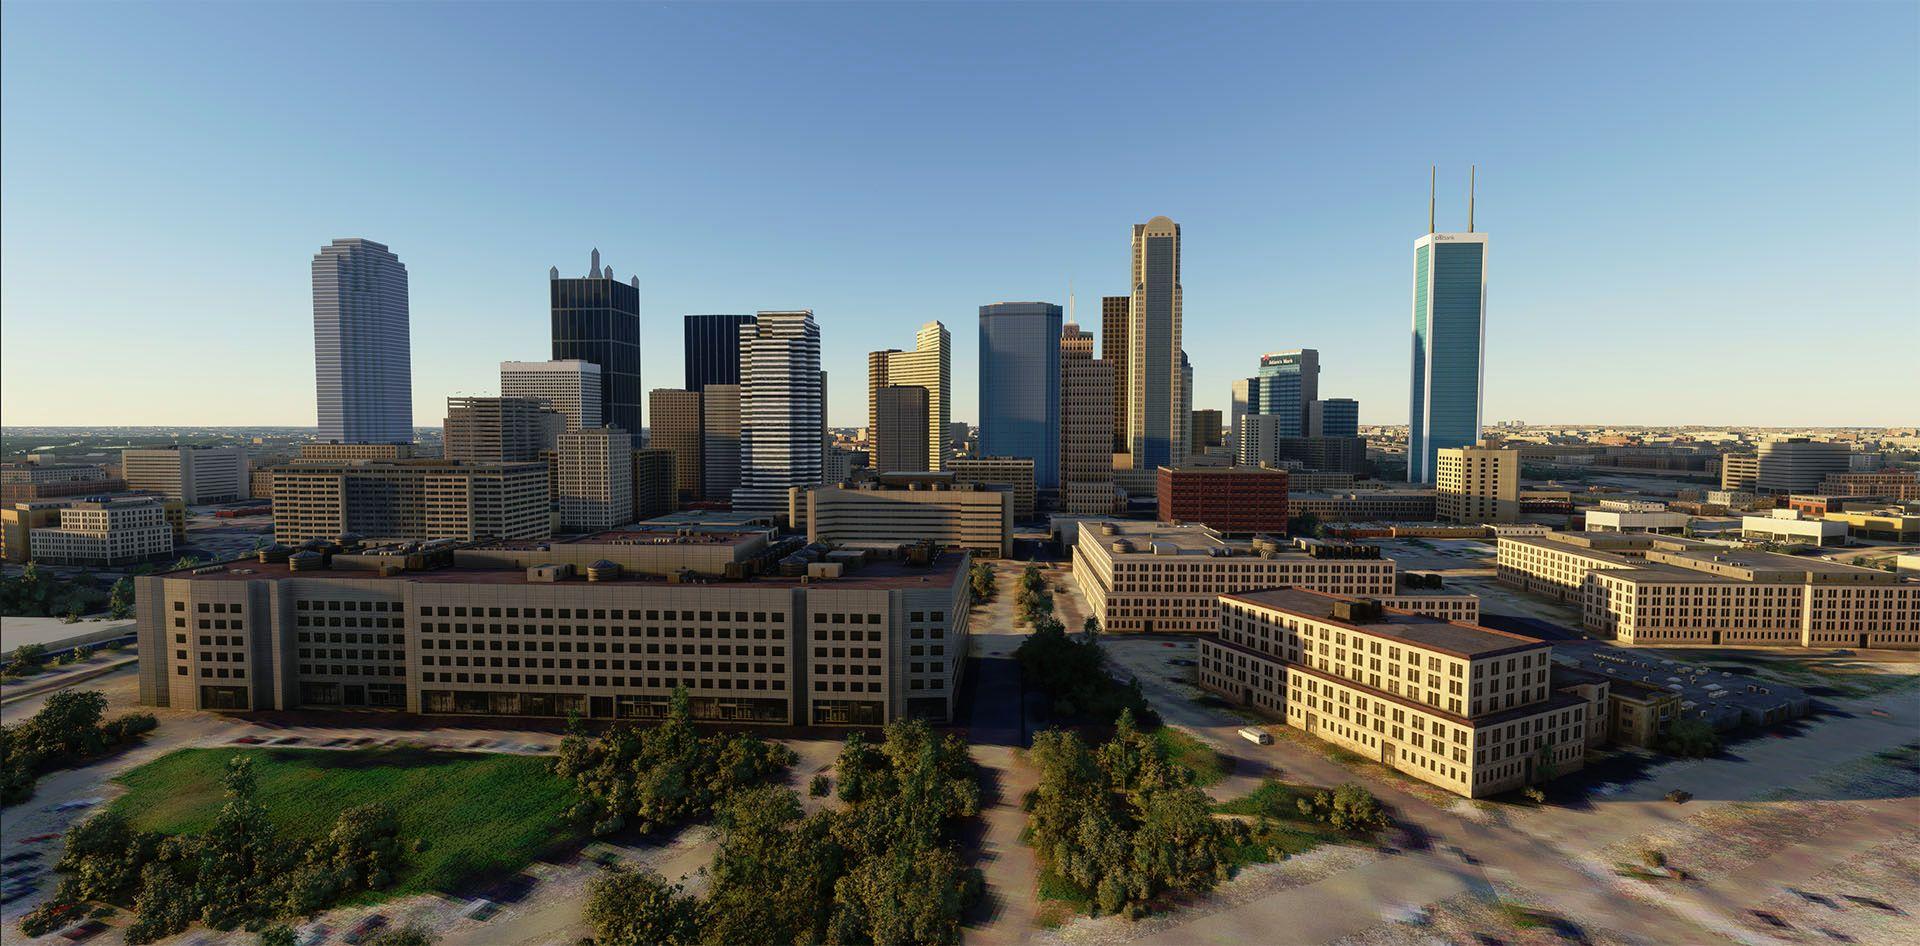 MSFS Dallas Photogrammetry